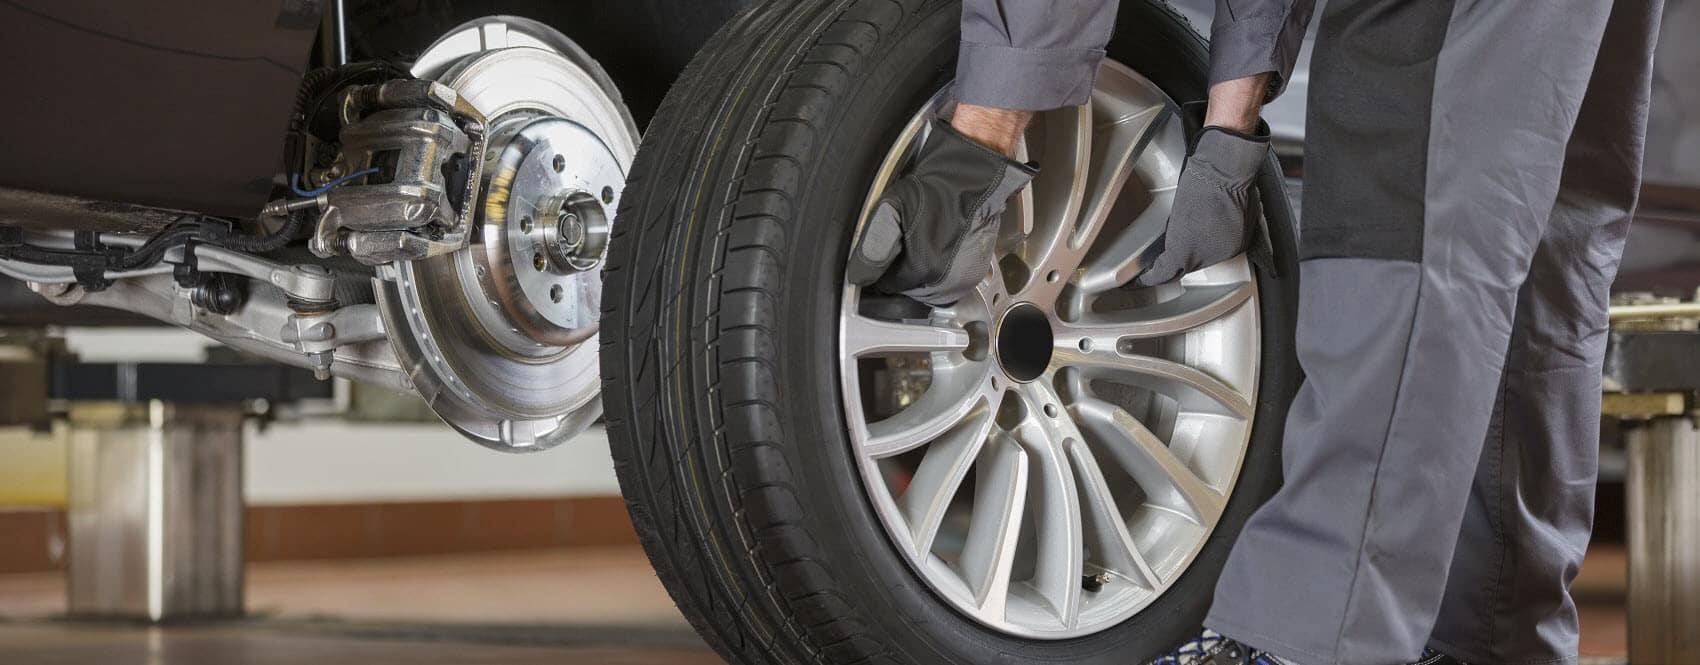 Toyota Tundra Maintenance Schedule   Toyota of Boerne